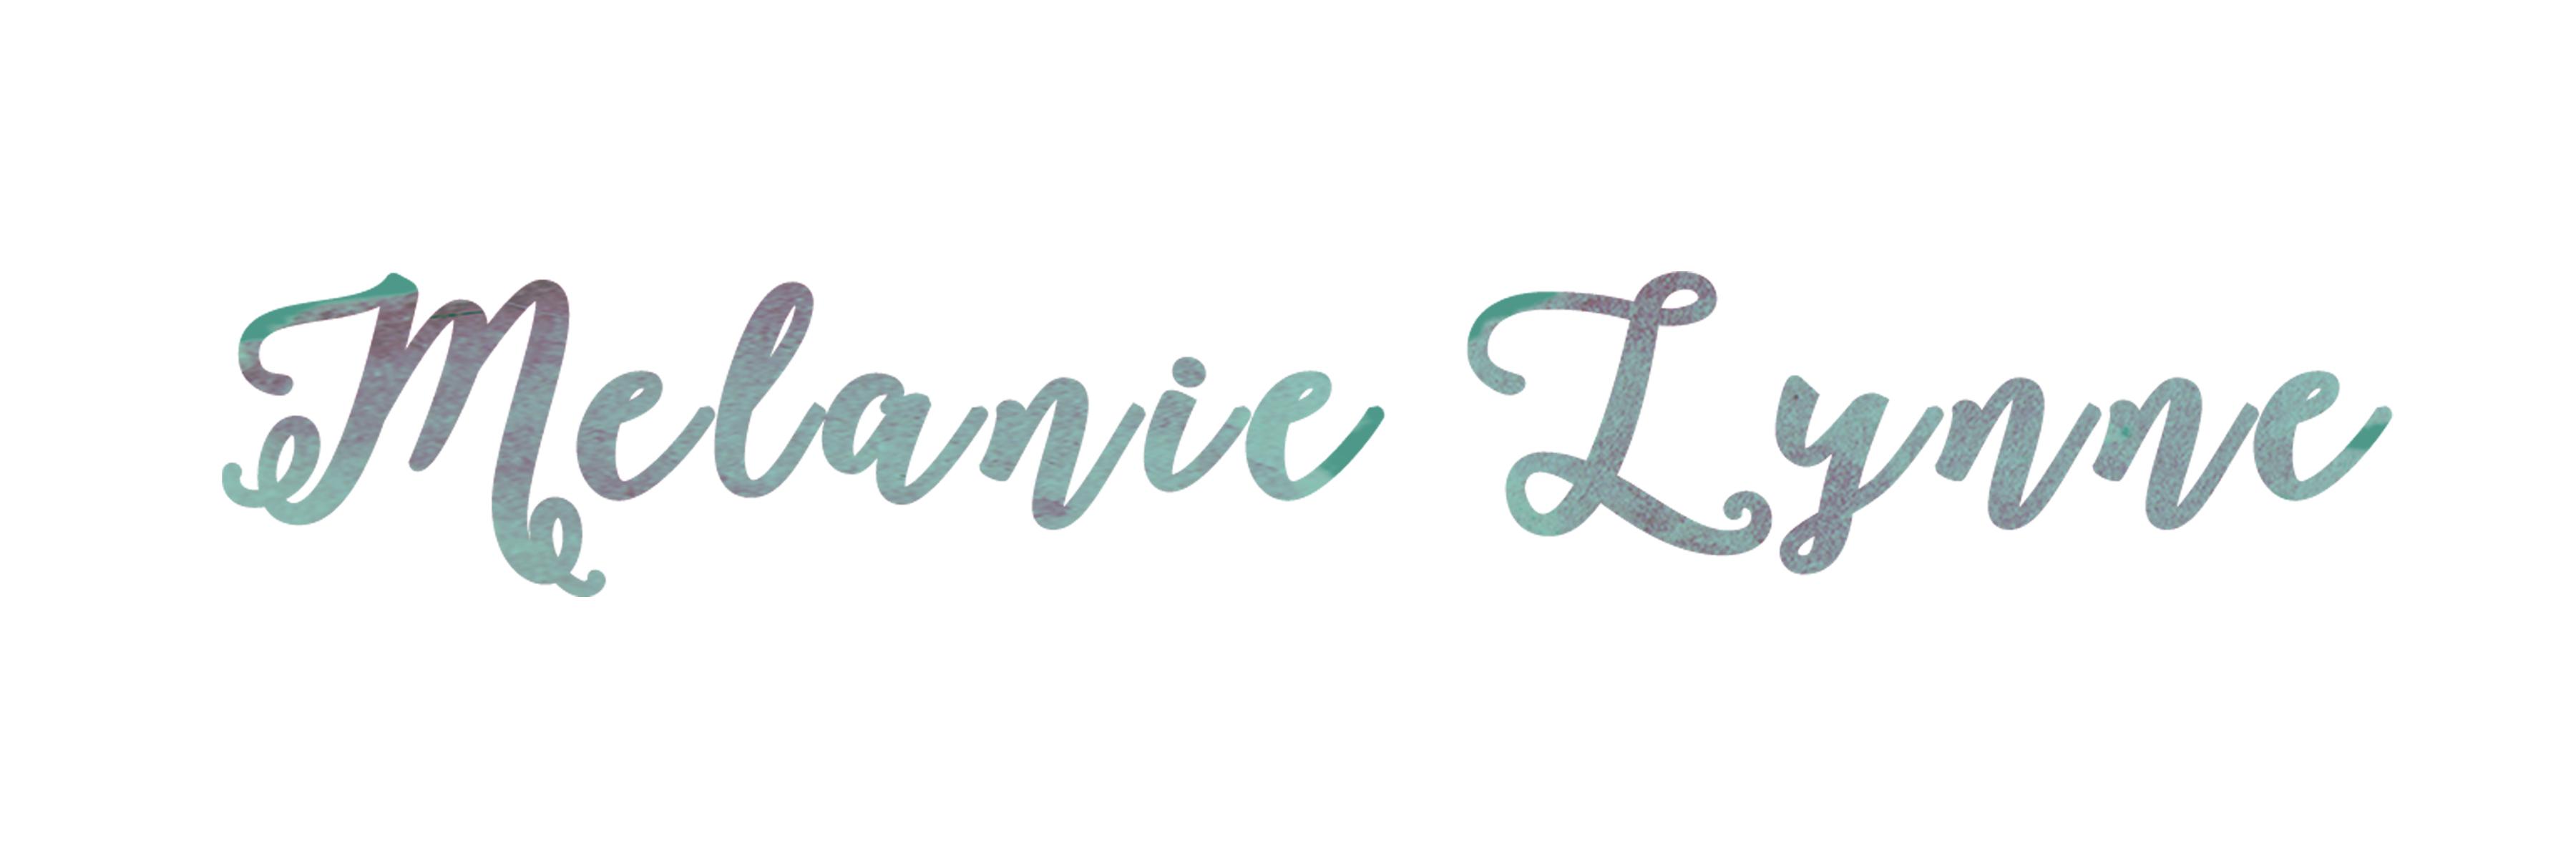 Melanie Allard Signature